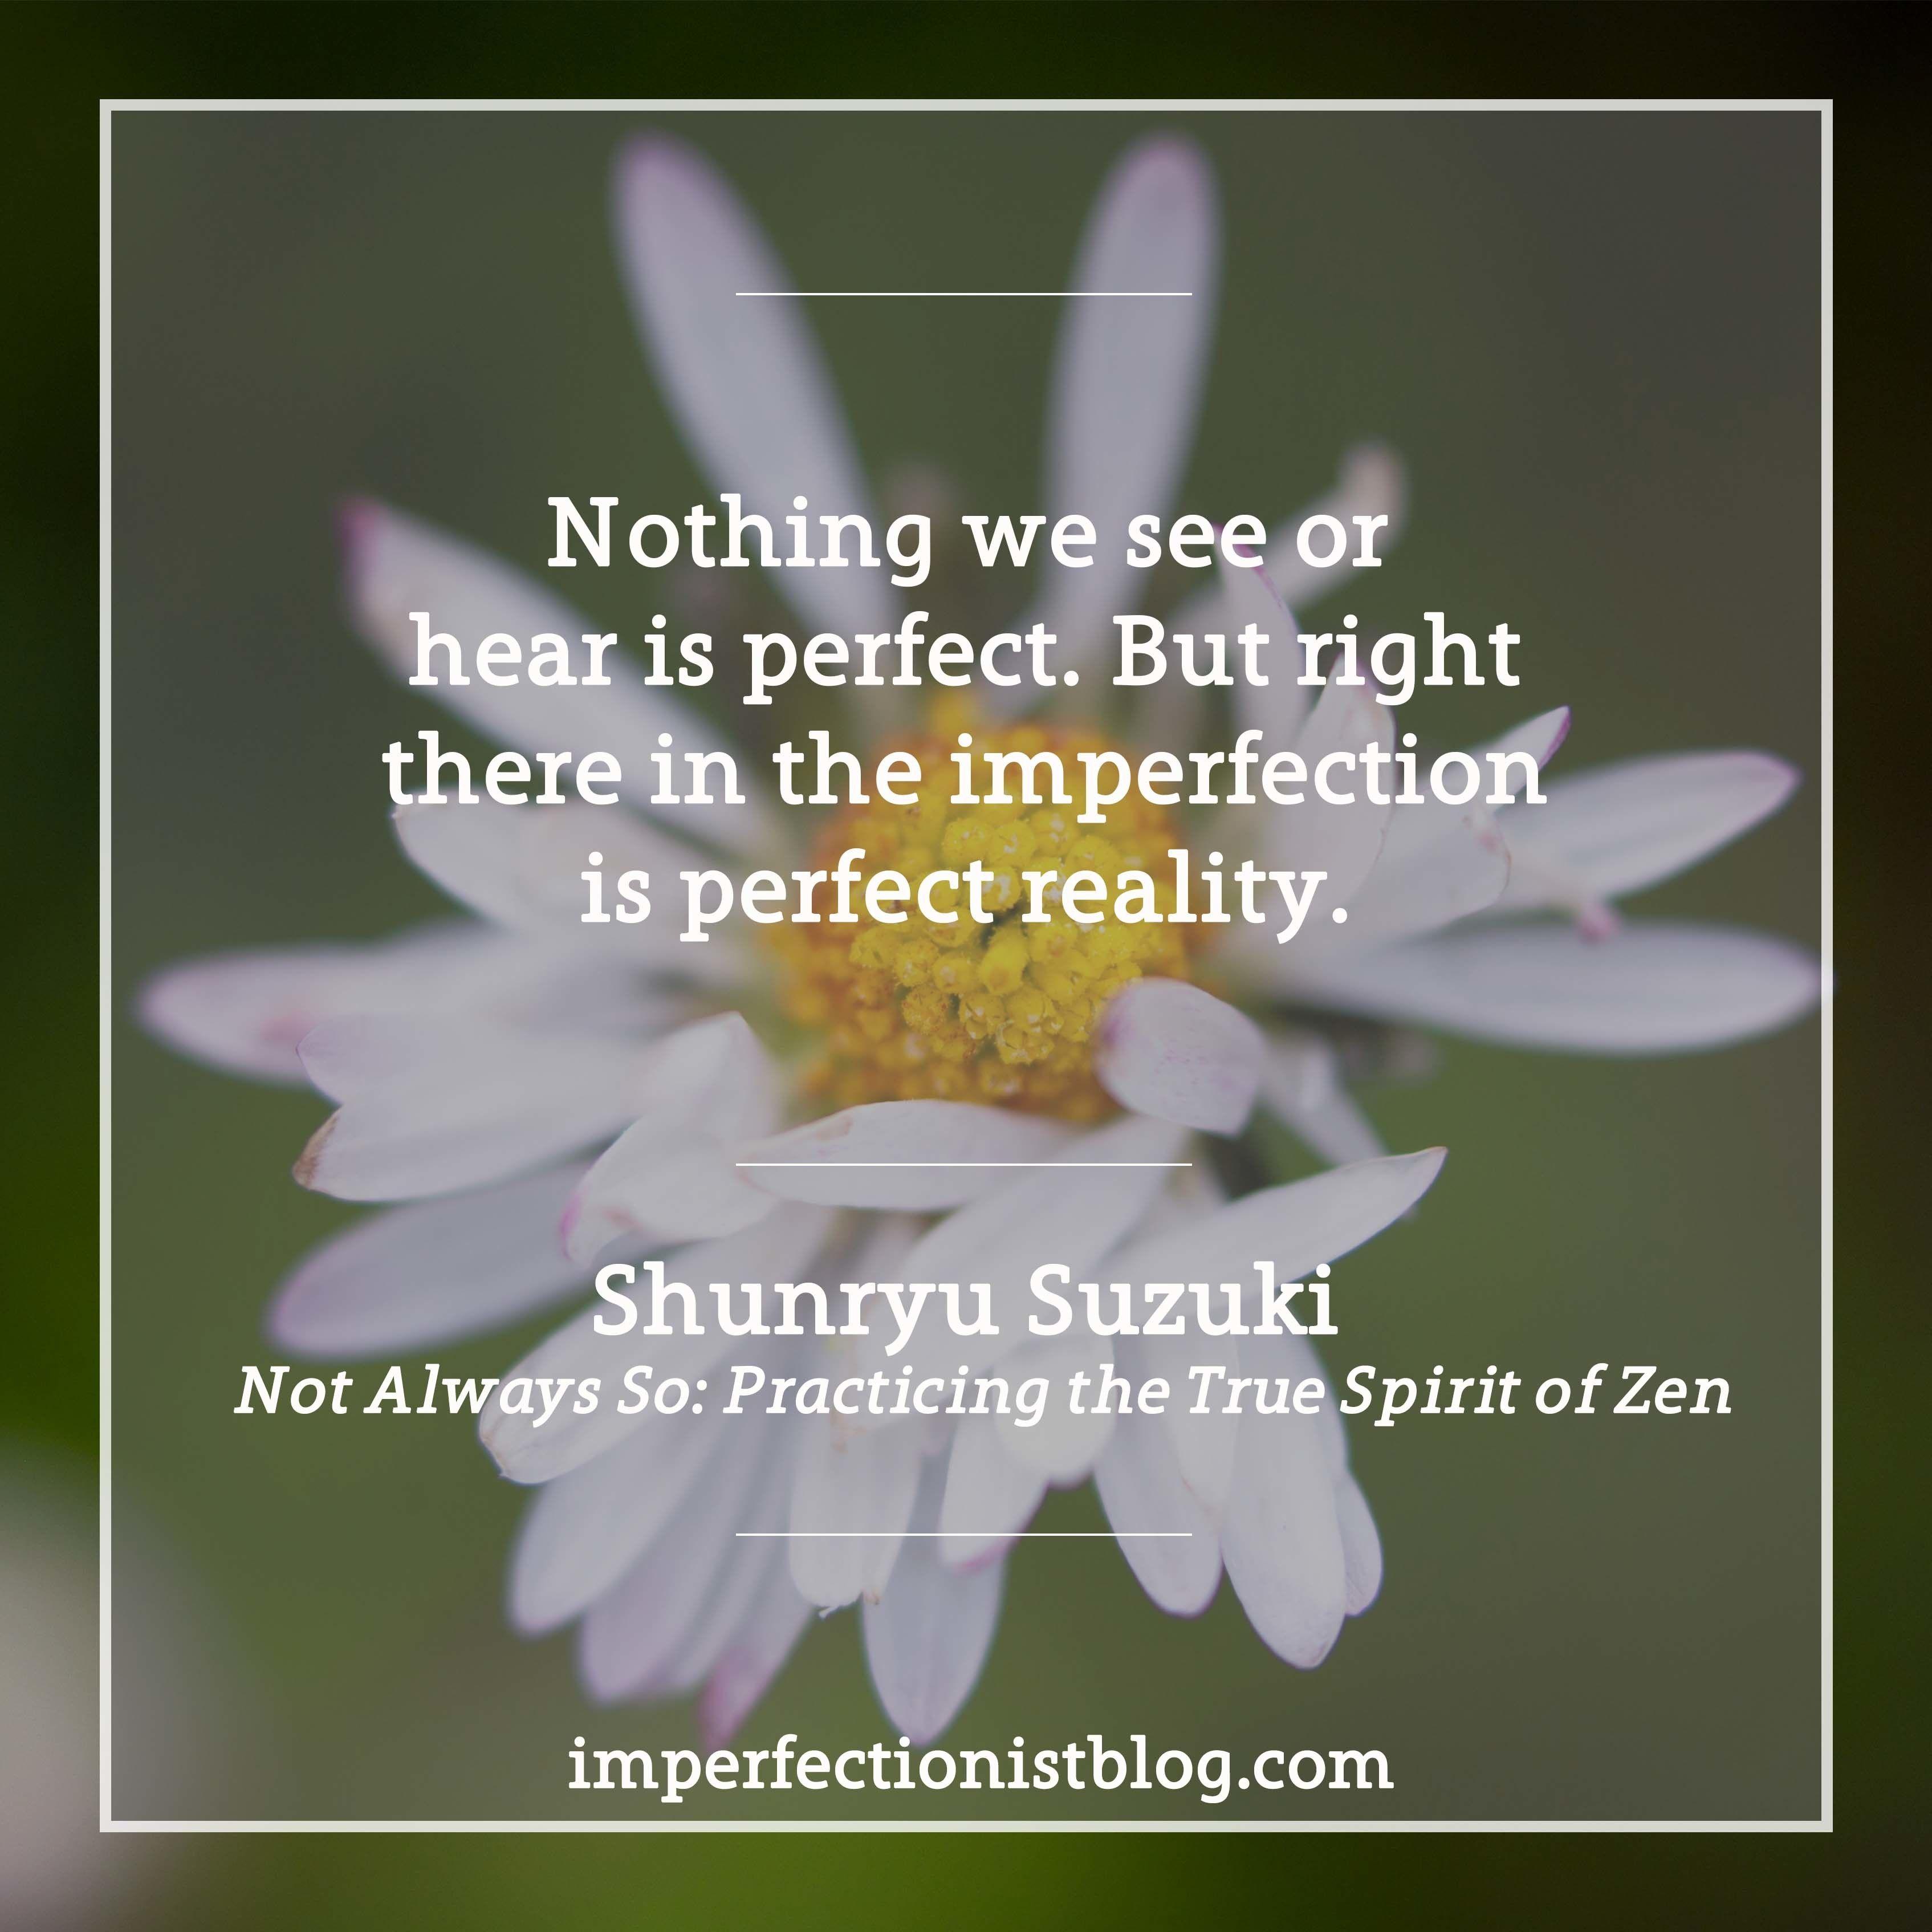 Quotes About Mindfulness Shunryu Suzuki Credited With Popularizing Zen Buddhism In Western